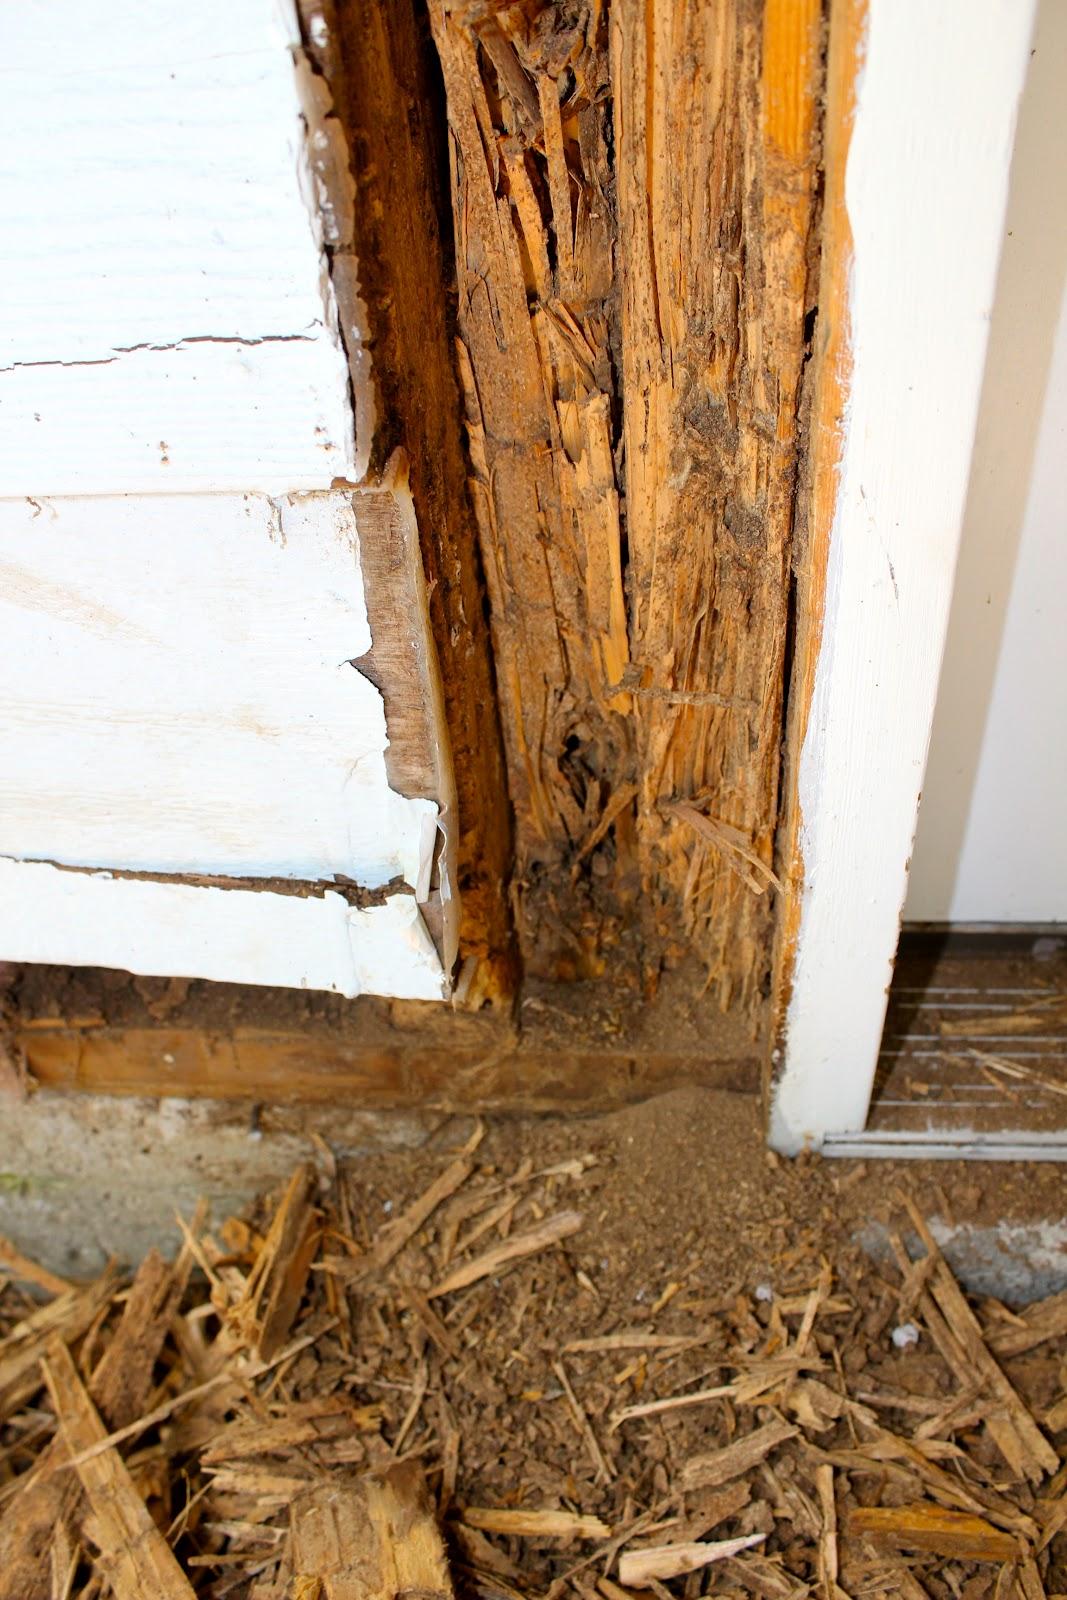 Termite Invasion Phillip S Natural World